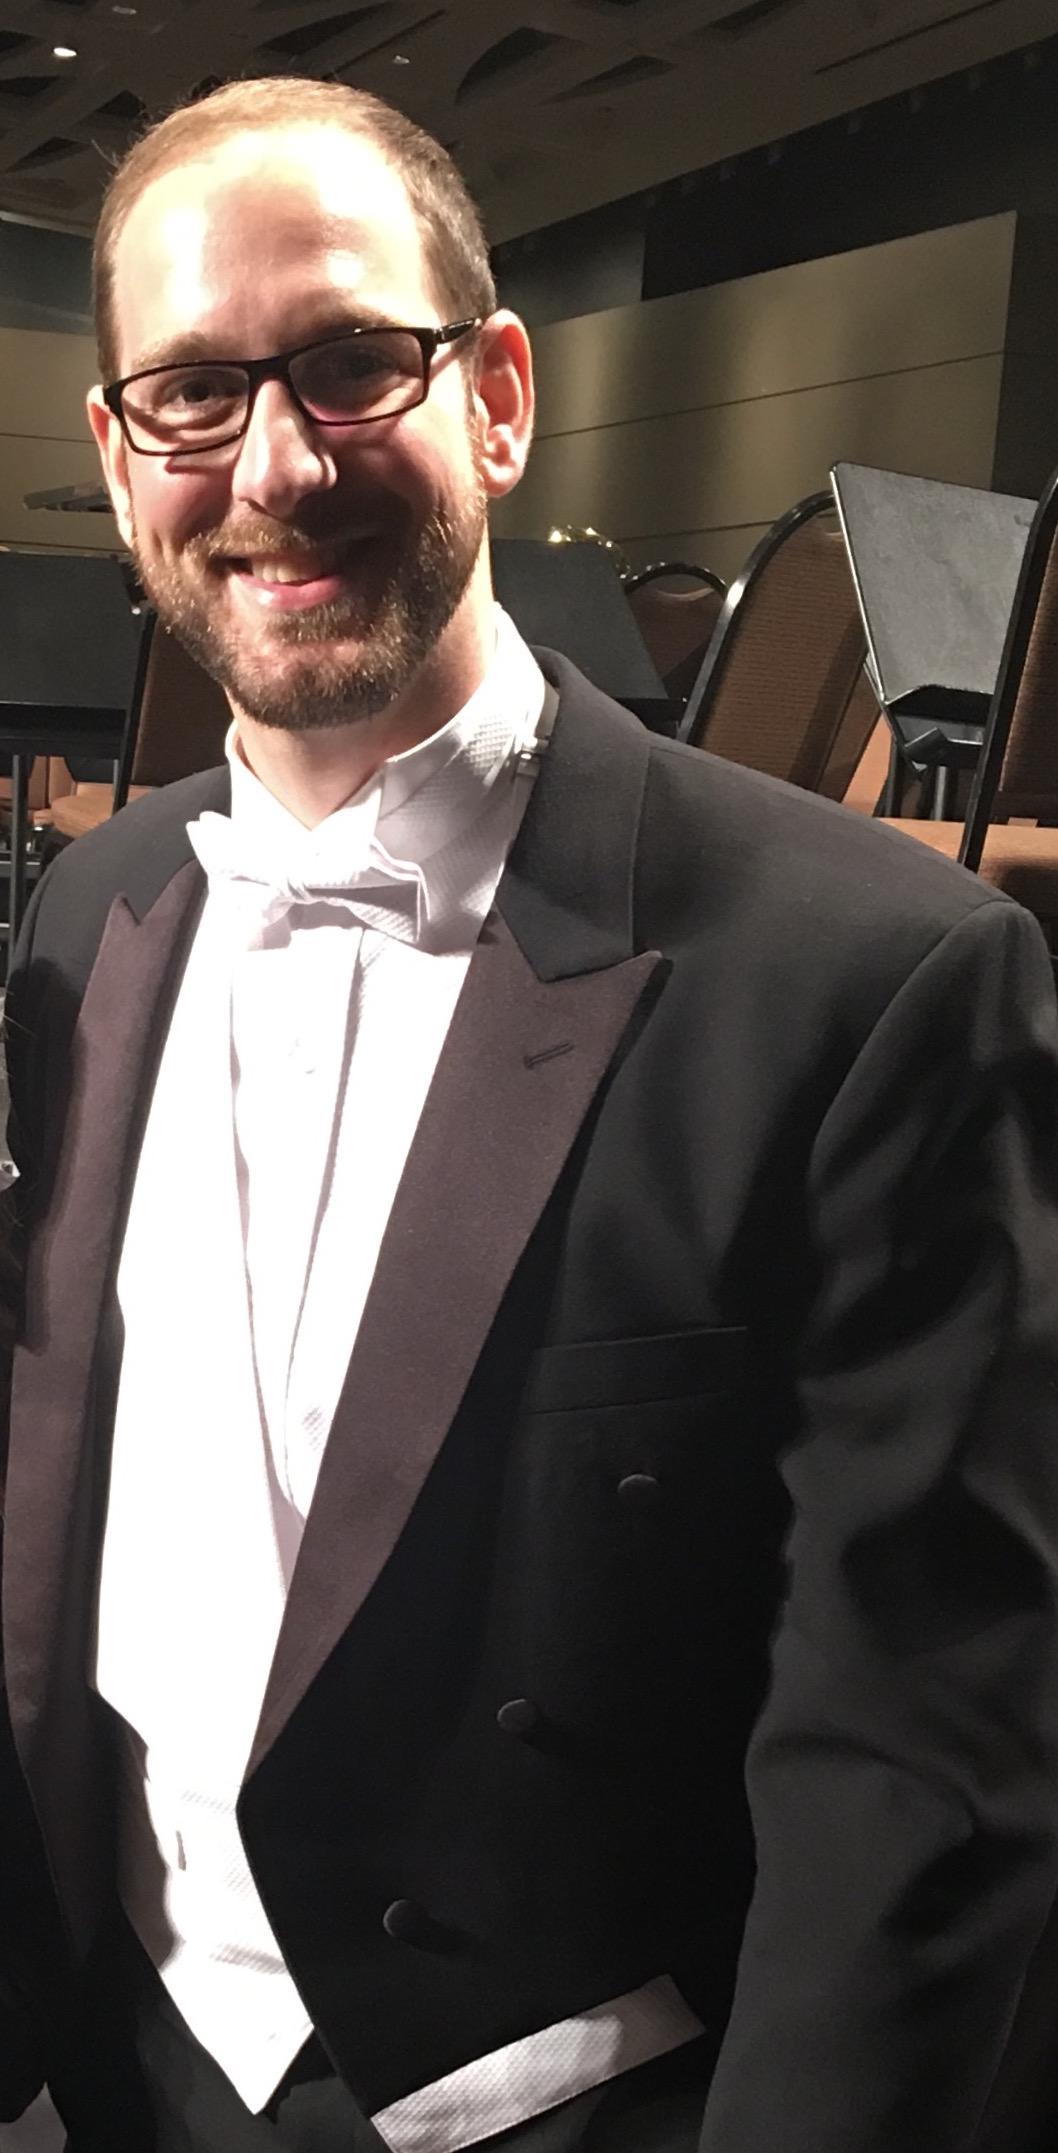 Conductor Dr. Mathhew J. Smith